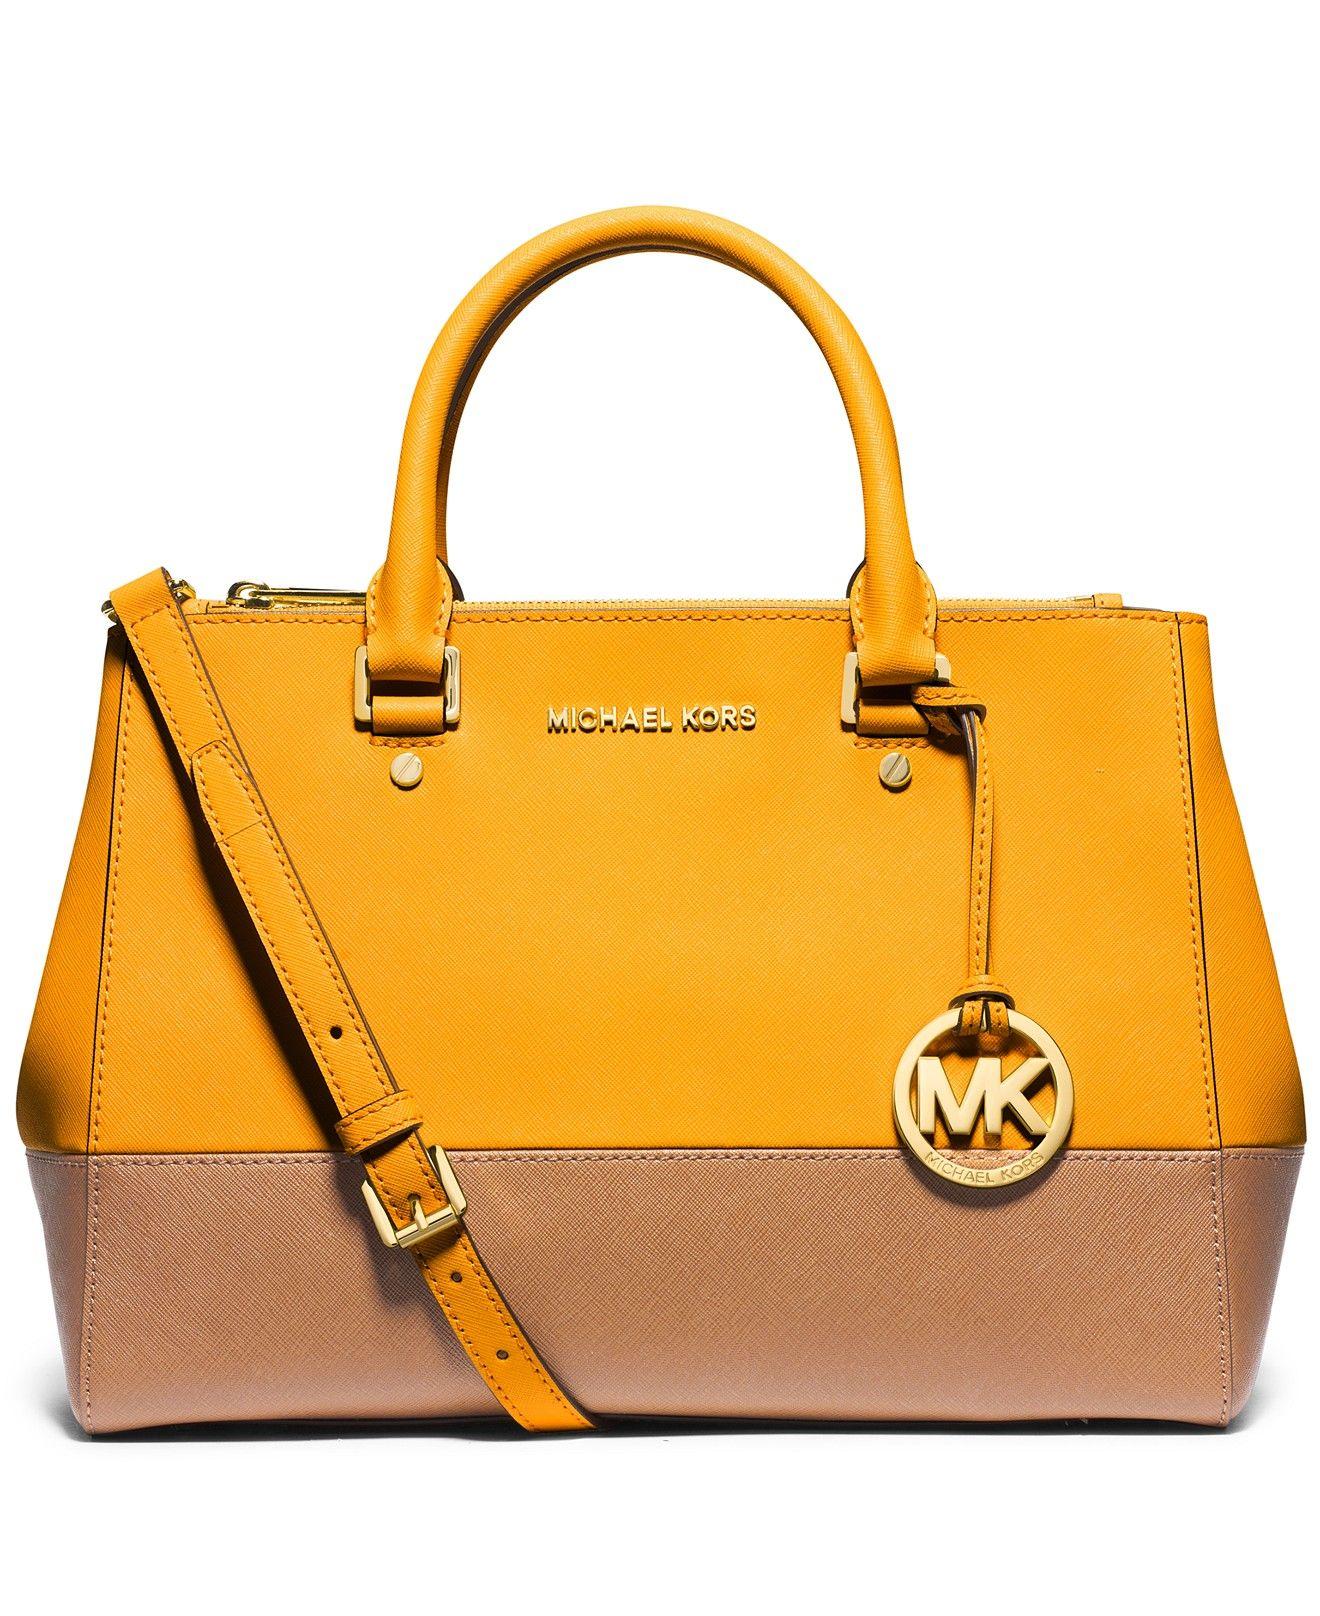 Michael Kors Sutton Medium Colorblock Satchel Handbags Bag Accessories Macys